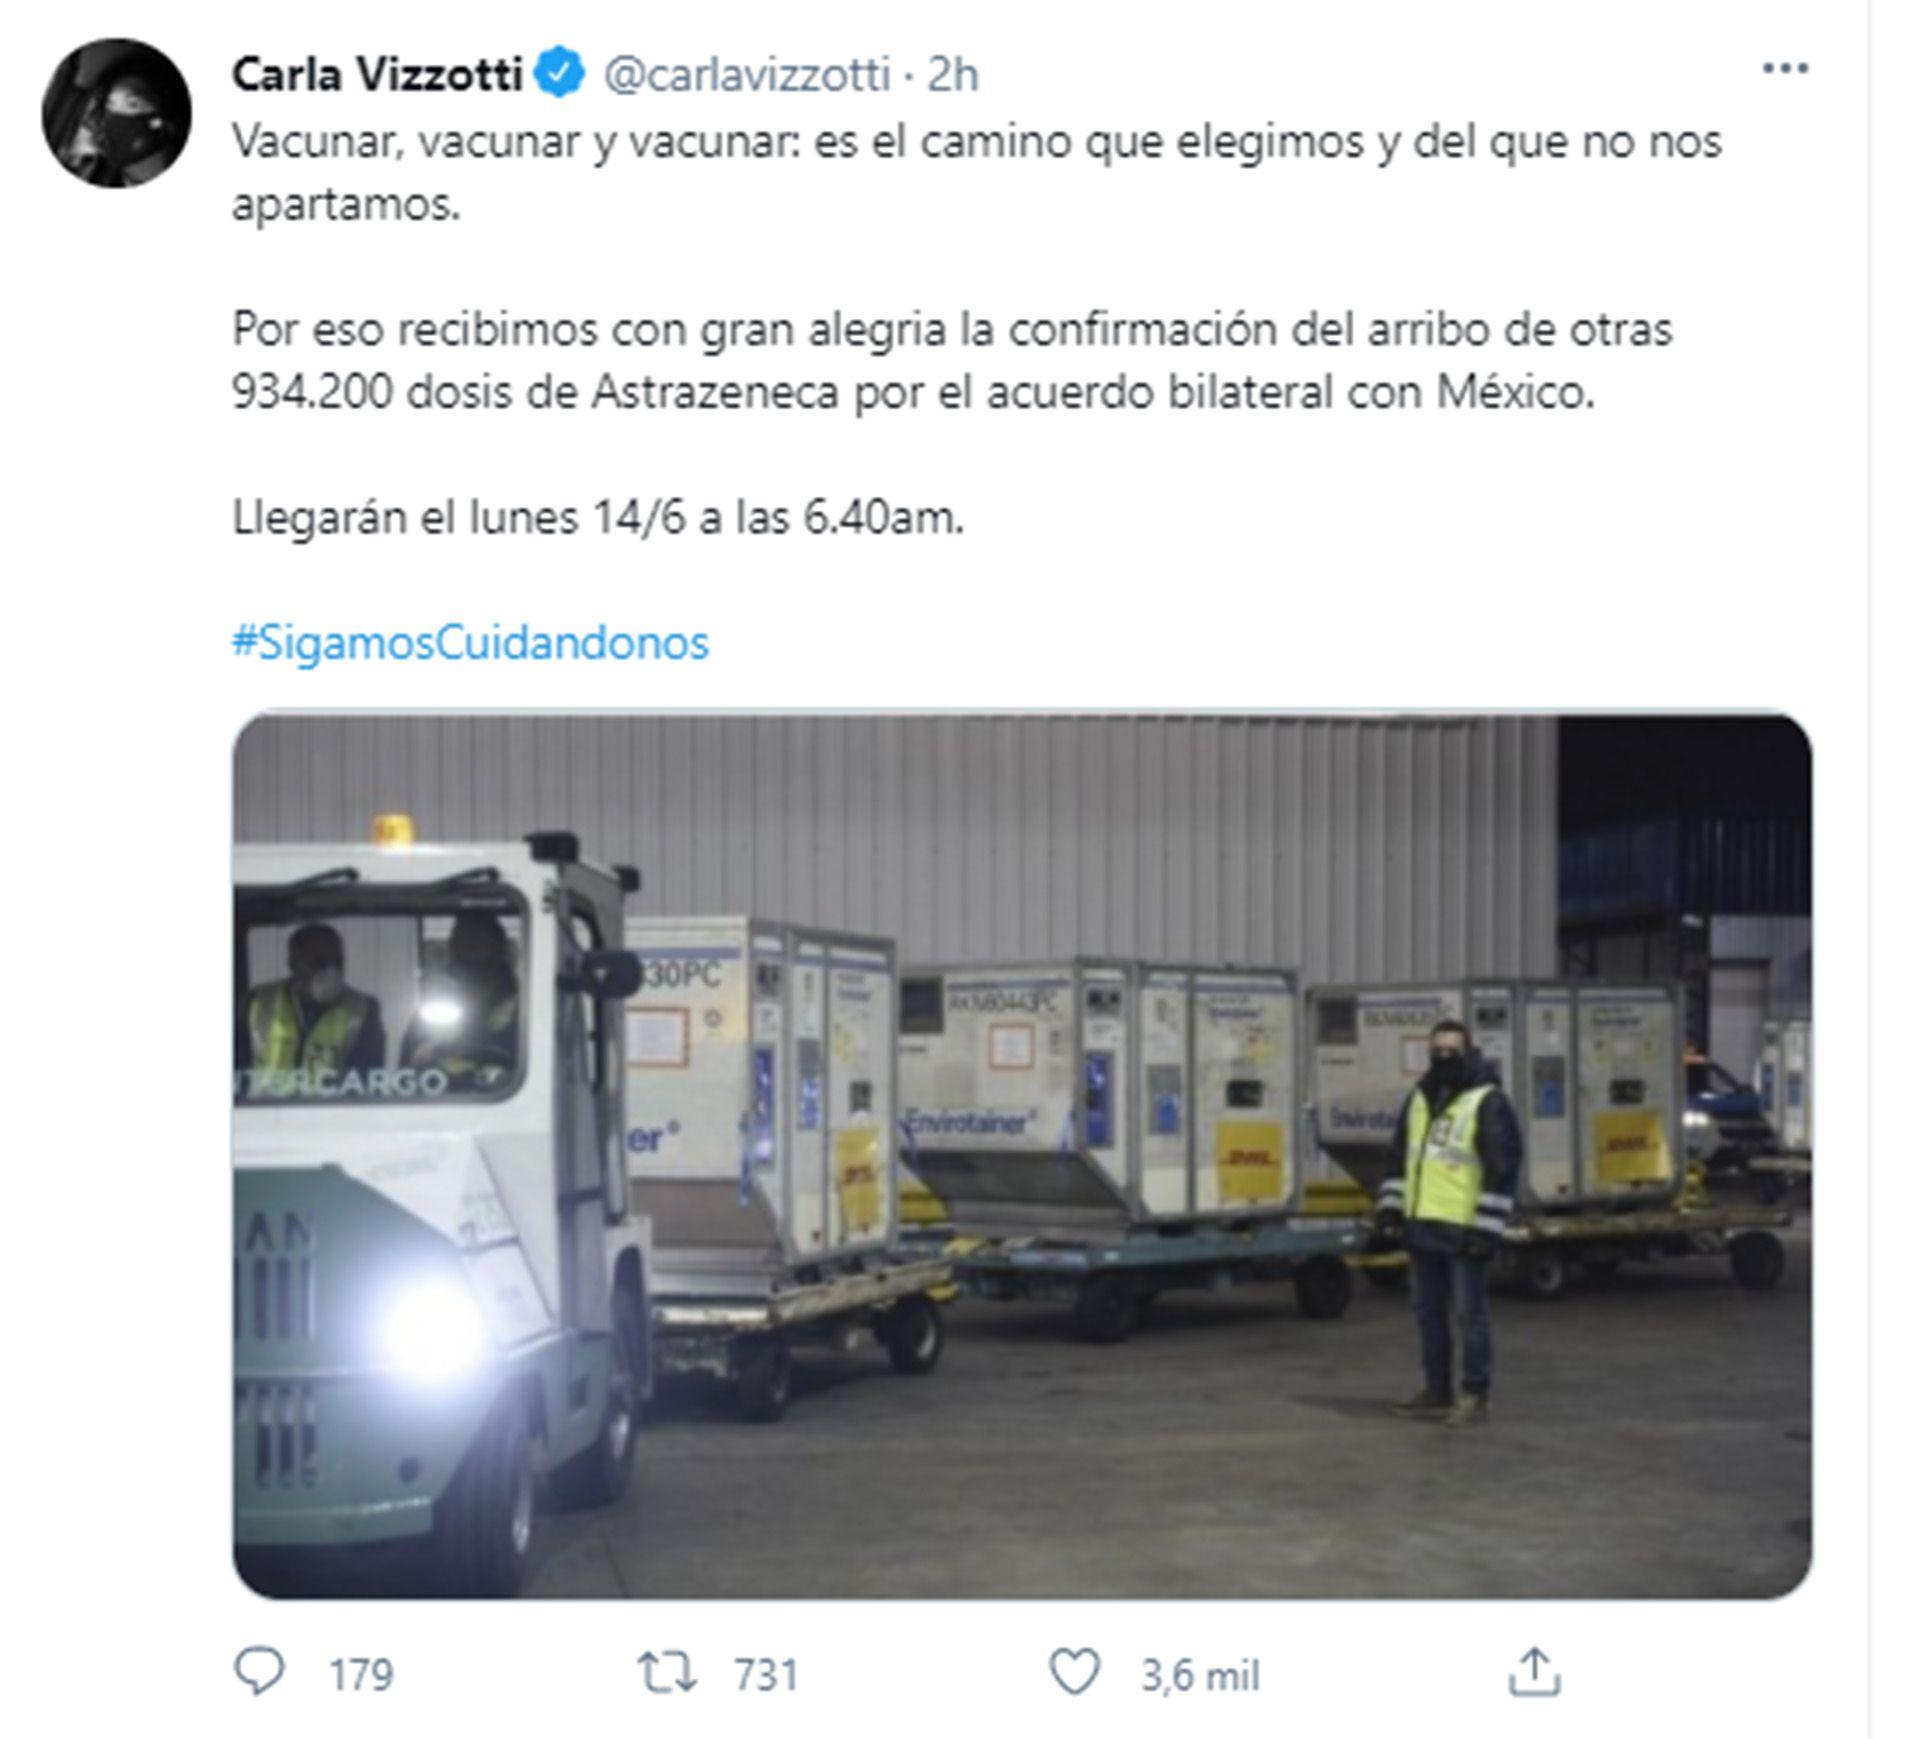 Carla Vizzotti tuit